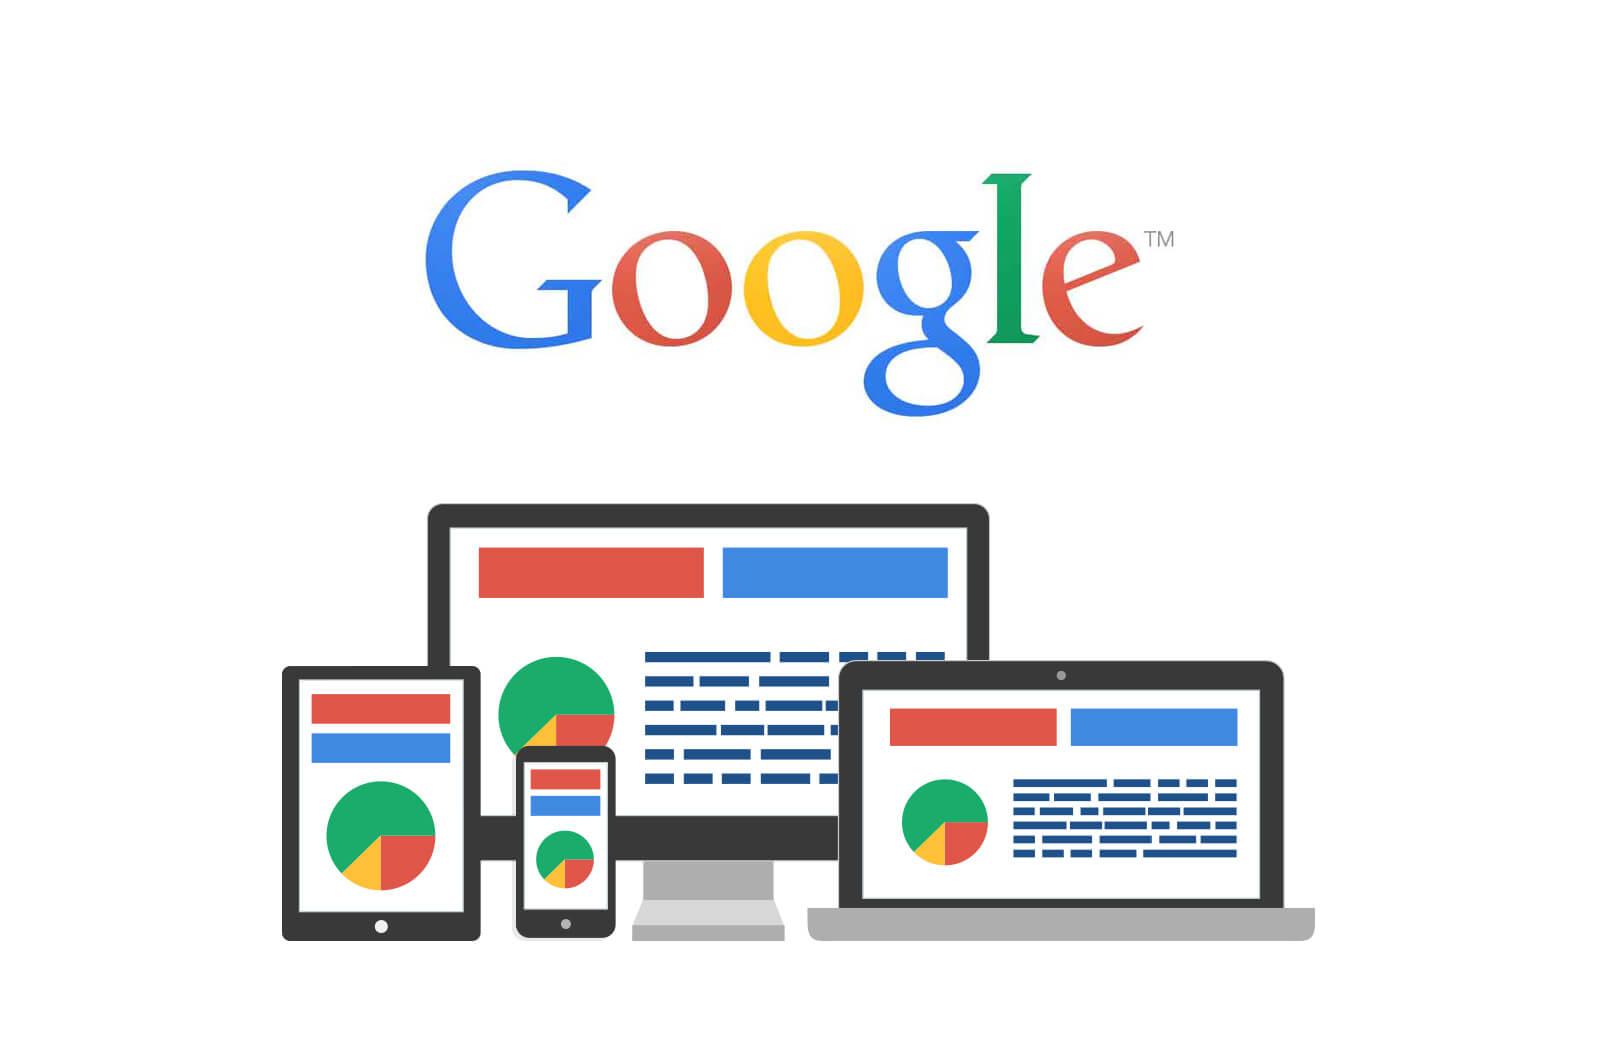 google-responsive-website-design-even-more-important.jpg